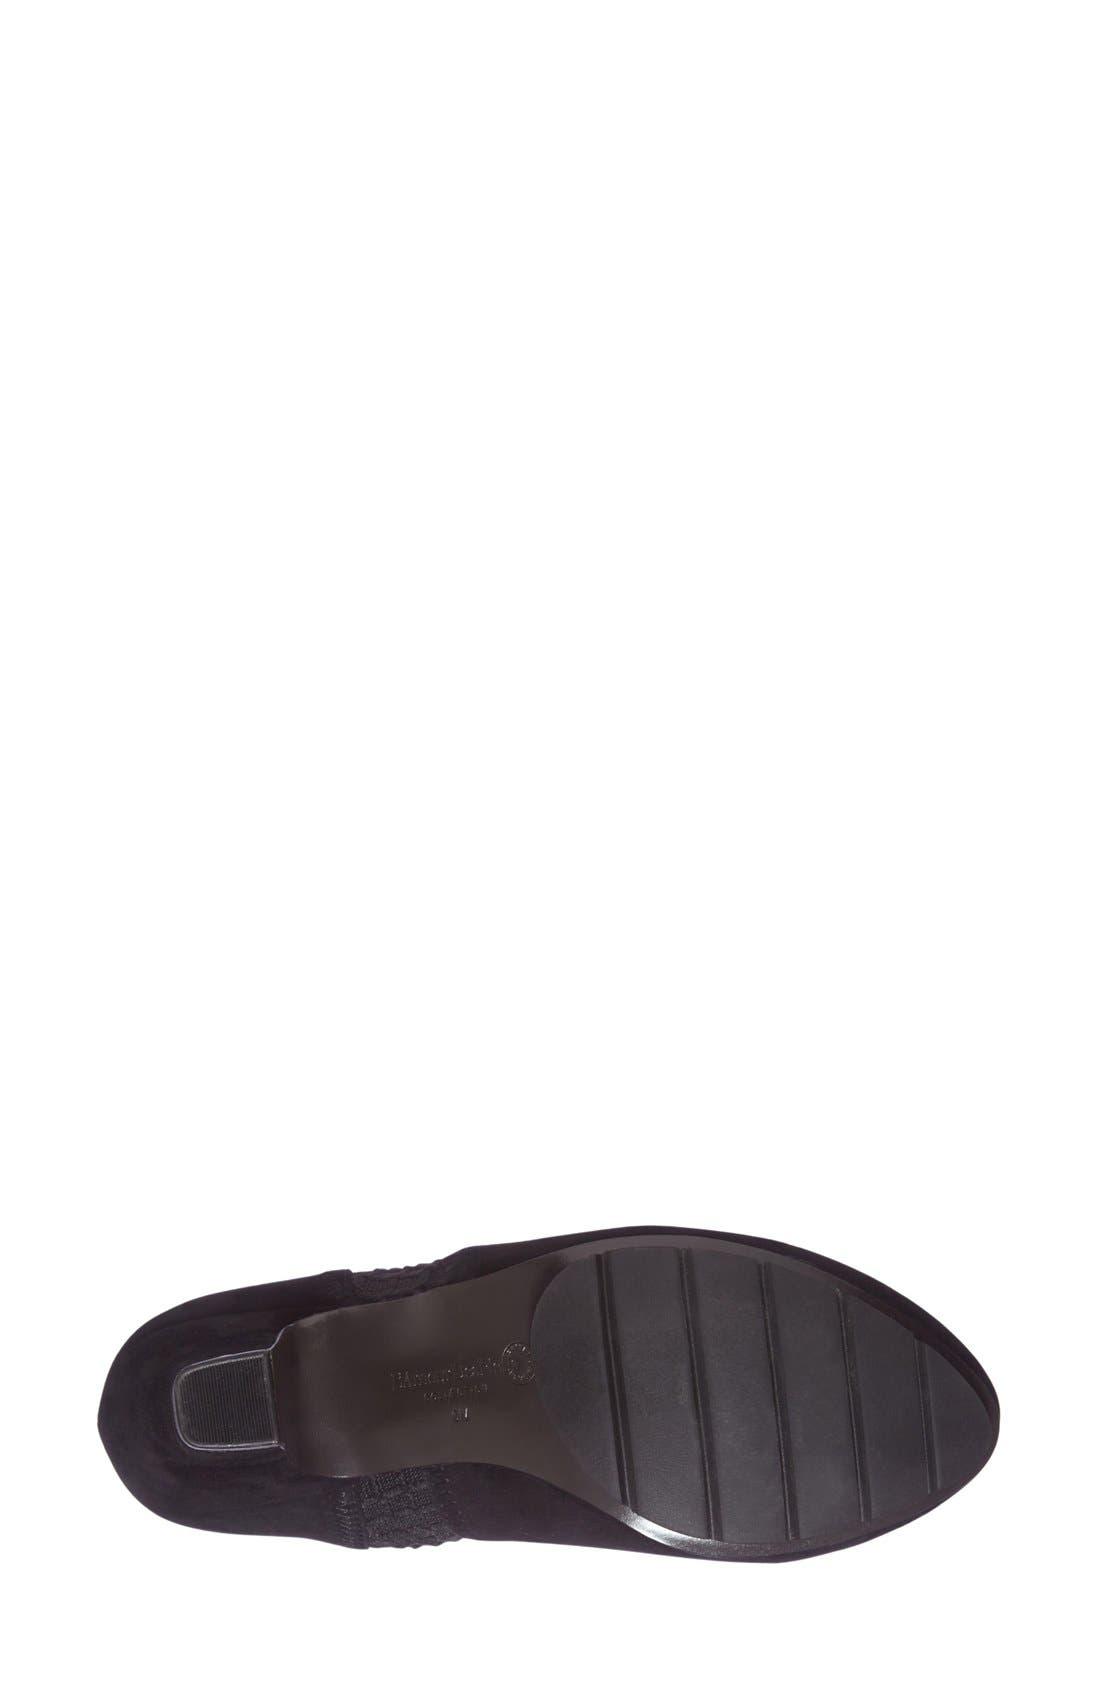 Alternate Image 4  - L'Amourdes Pieds'Faaris' Chelsea Boot (Women)